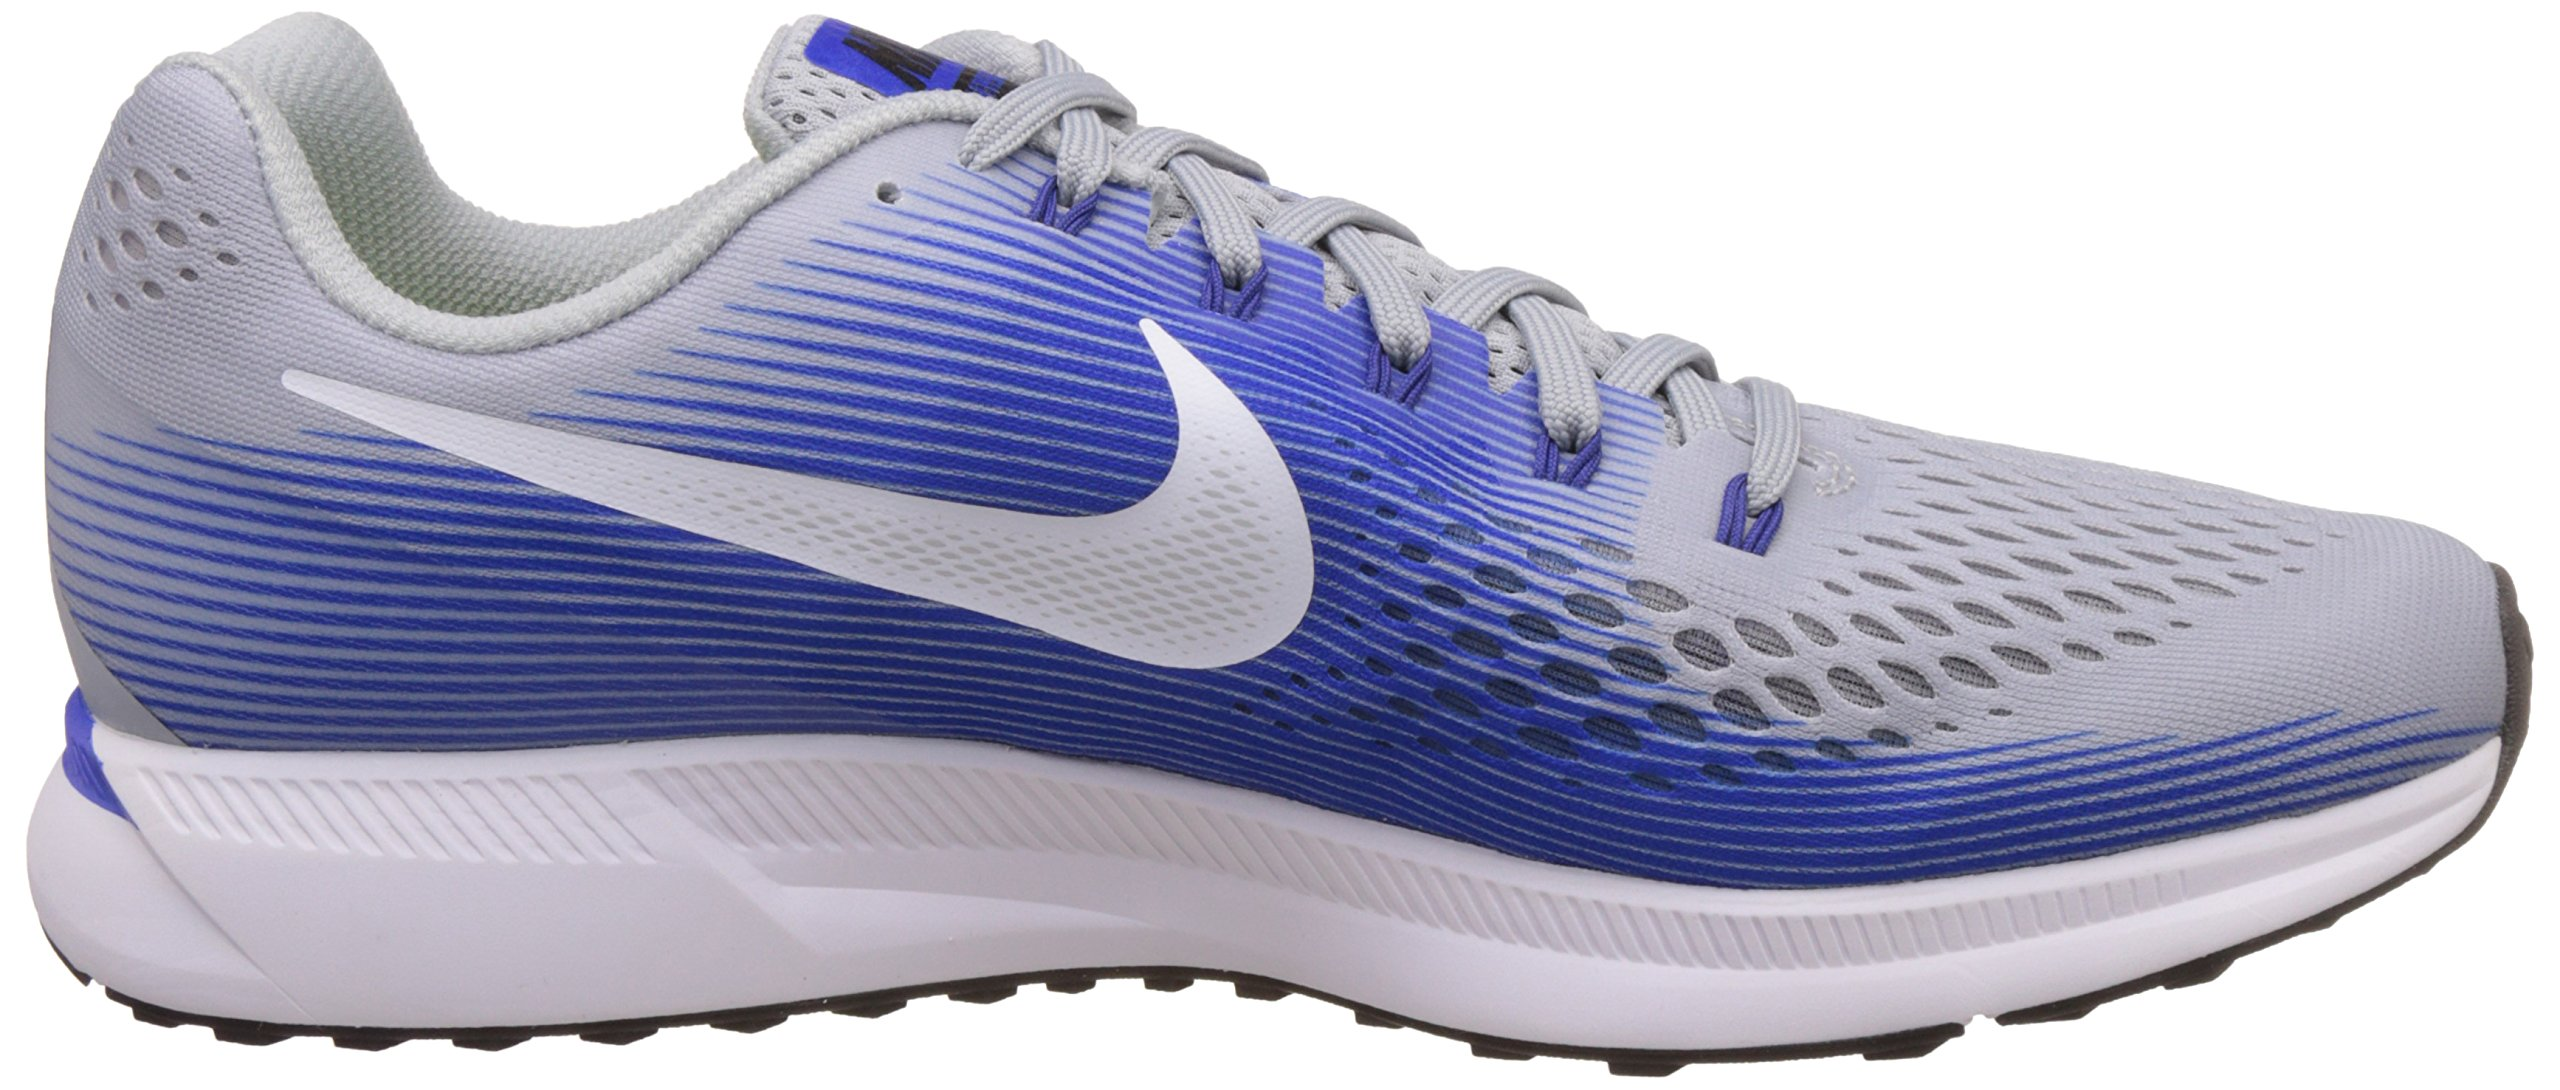 NIKE Mens Air Zoom Pegasus 34 Running Shoe (11 M US, Wolf Grey/White/Racer Blue) by Nike (Image #6)